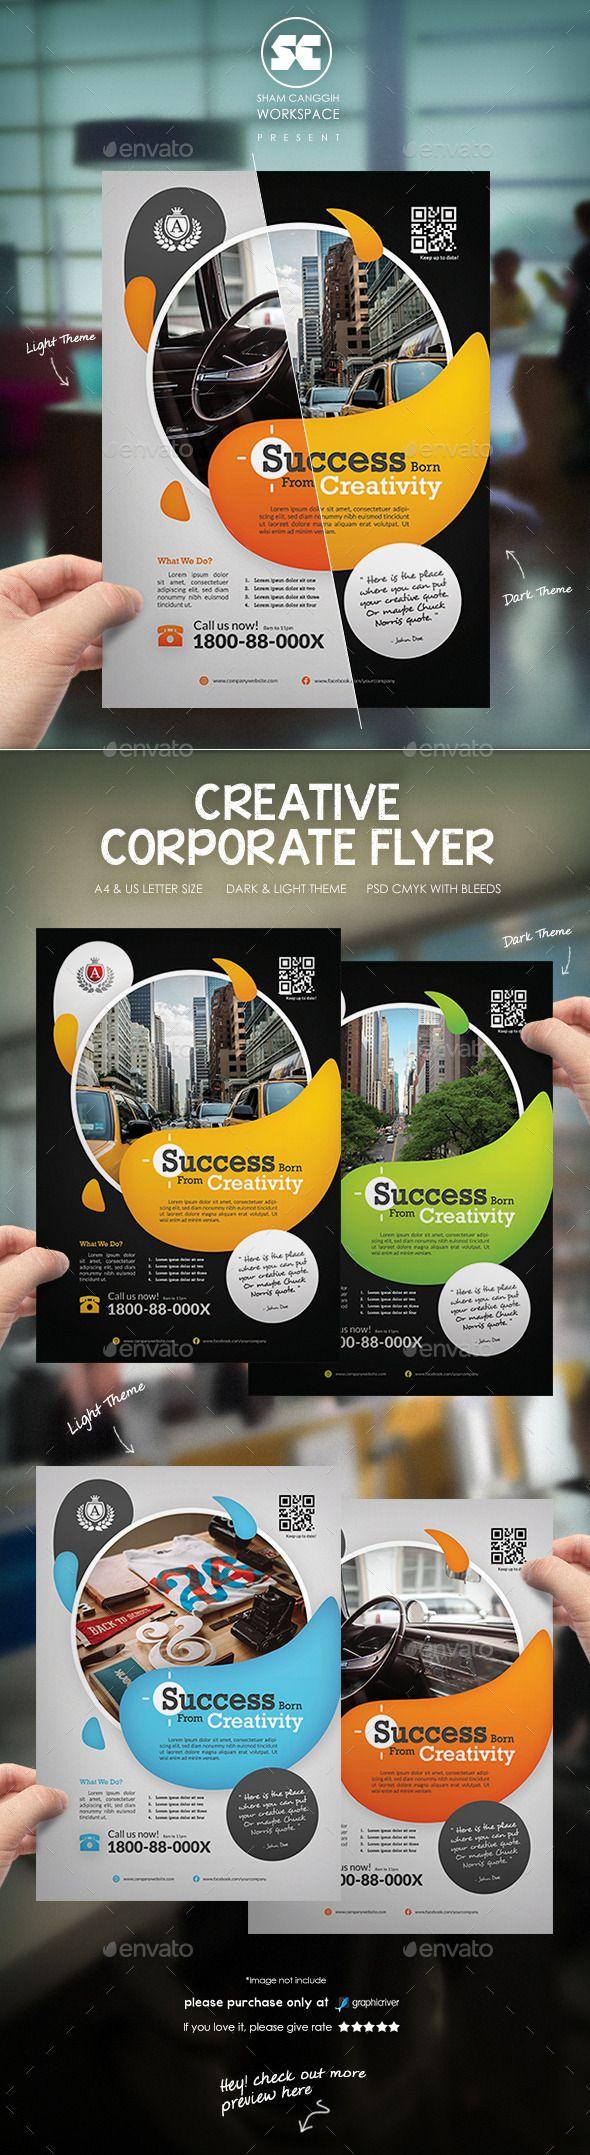 Creative Corporate Flyer Template #design Download: http://graphicriver.net/item/creative-corporate-flyer/12236562?ref=ksioks